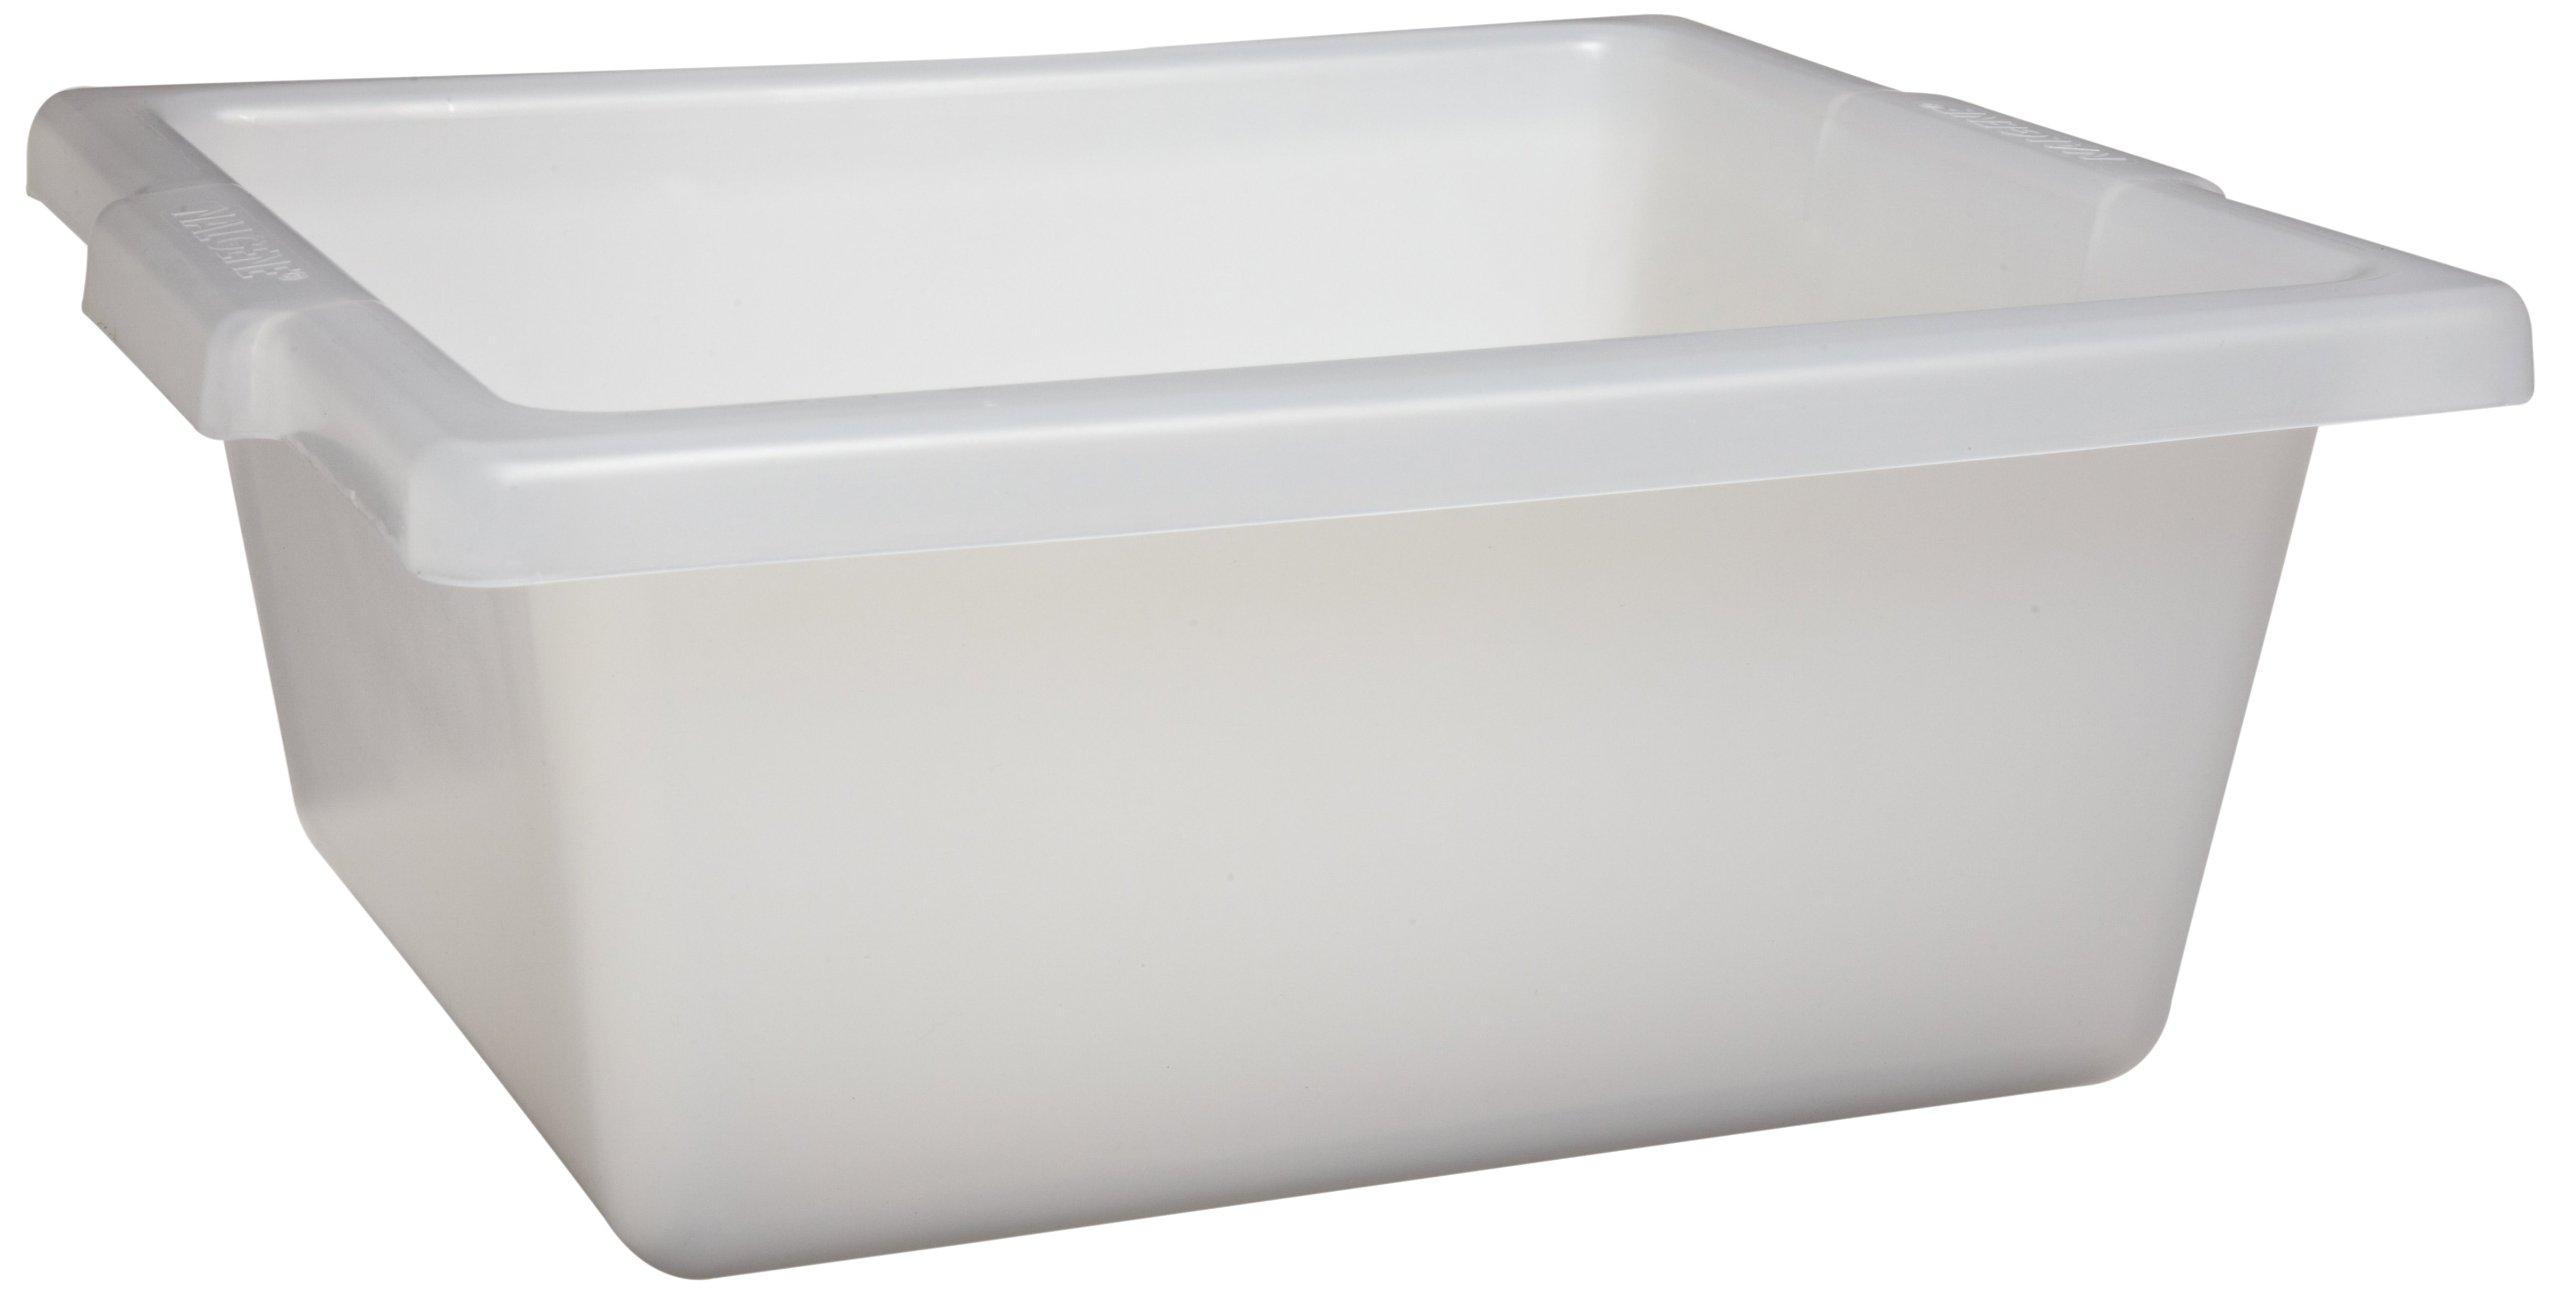 Nalgene Large Sterilizing Pan, Autoclavable, Polypropylene, 9.5L Capacity